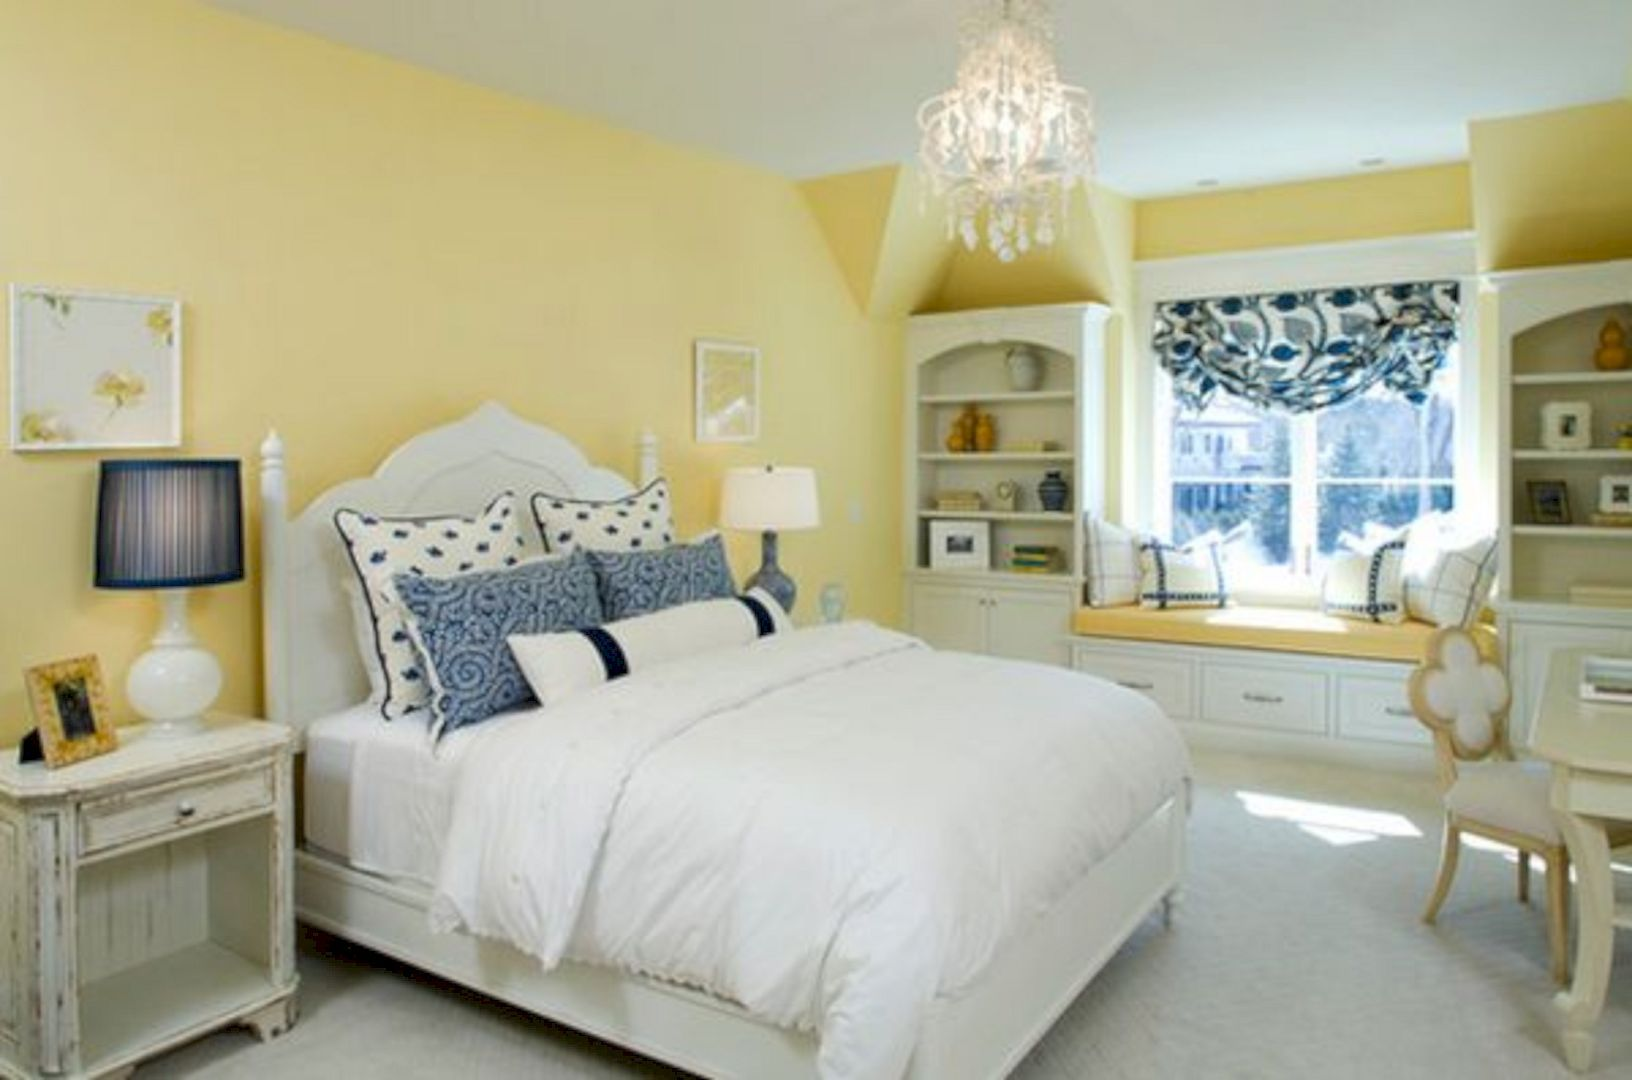 Macbook Pro 16- Model Designed Defy Limits Blue Bedroom Traditional